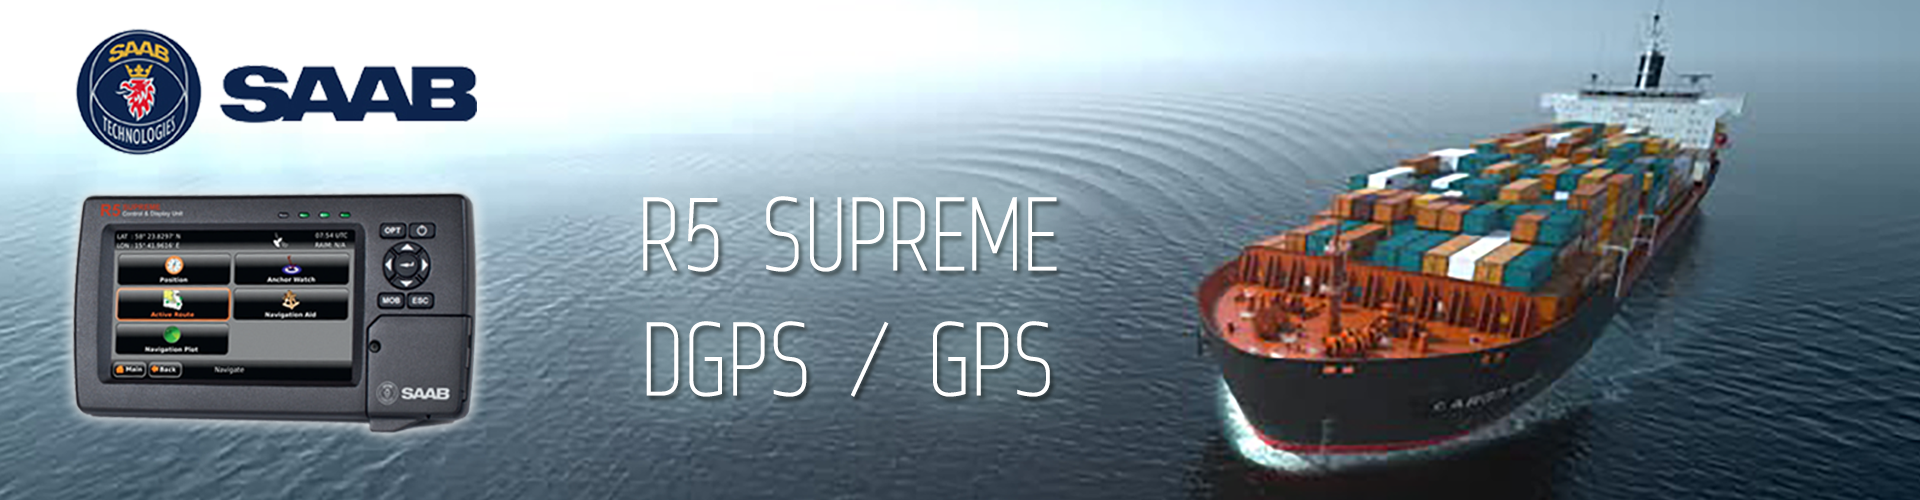 SAAB R5 SUPREME GPS / DGPS